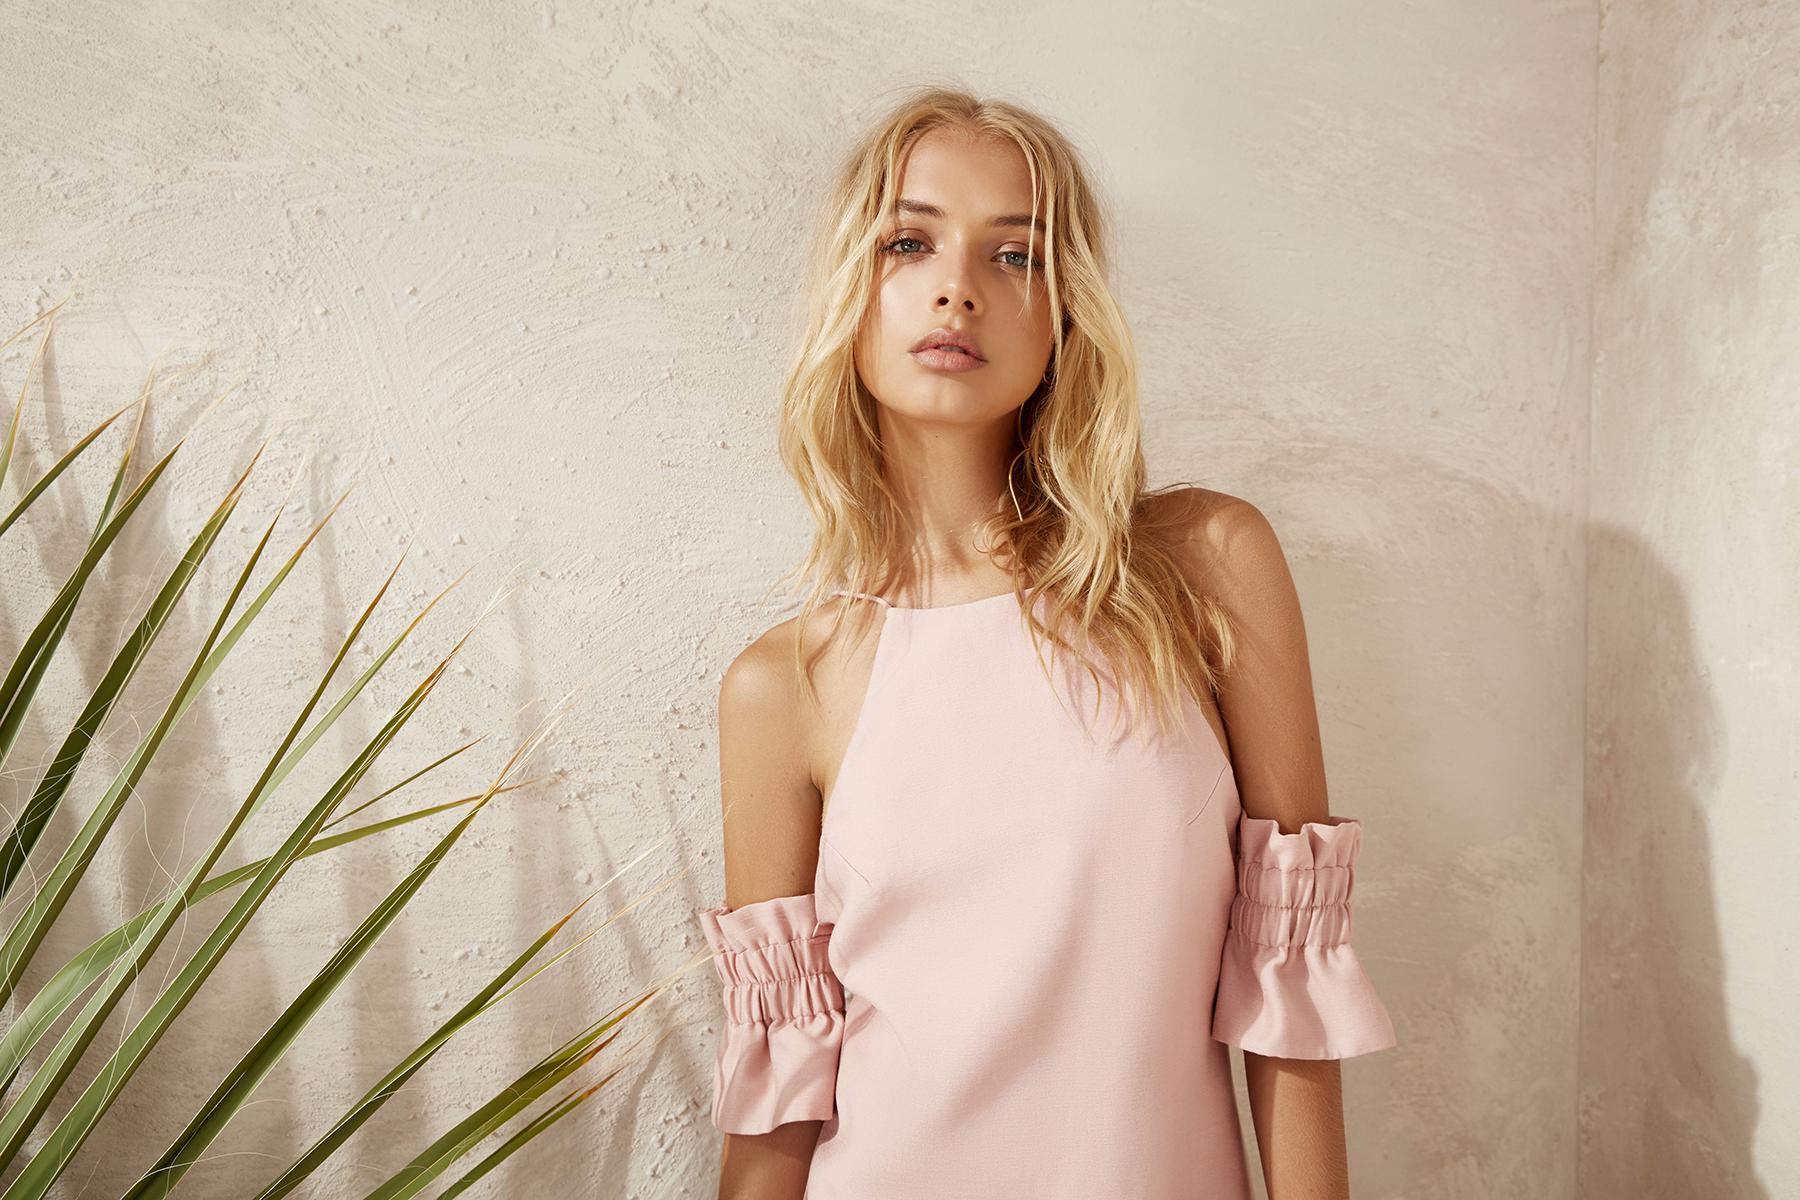 Shop C/MEO Double Take Mini Dress.